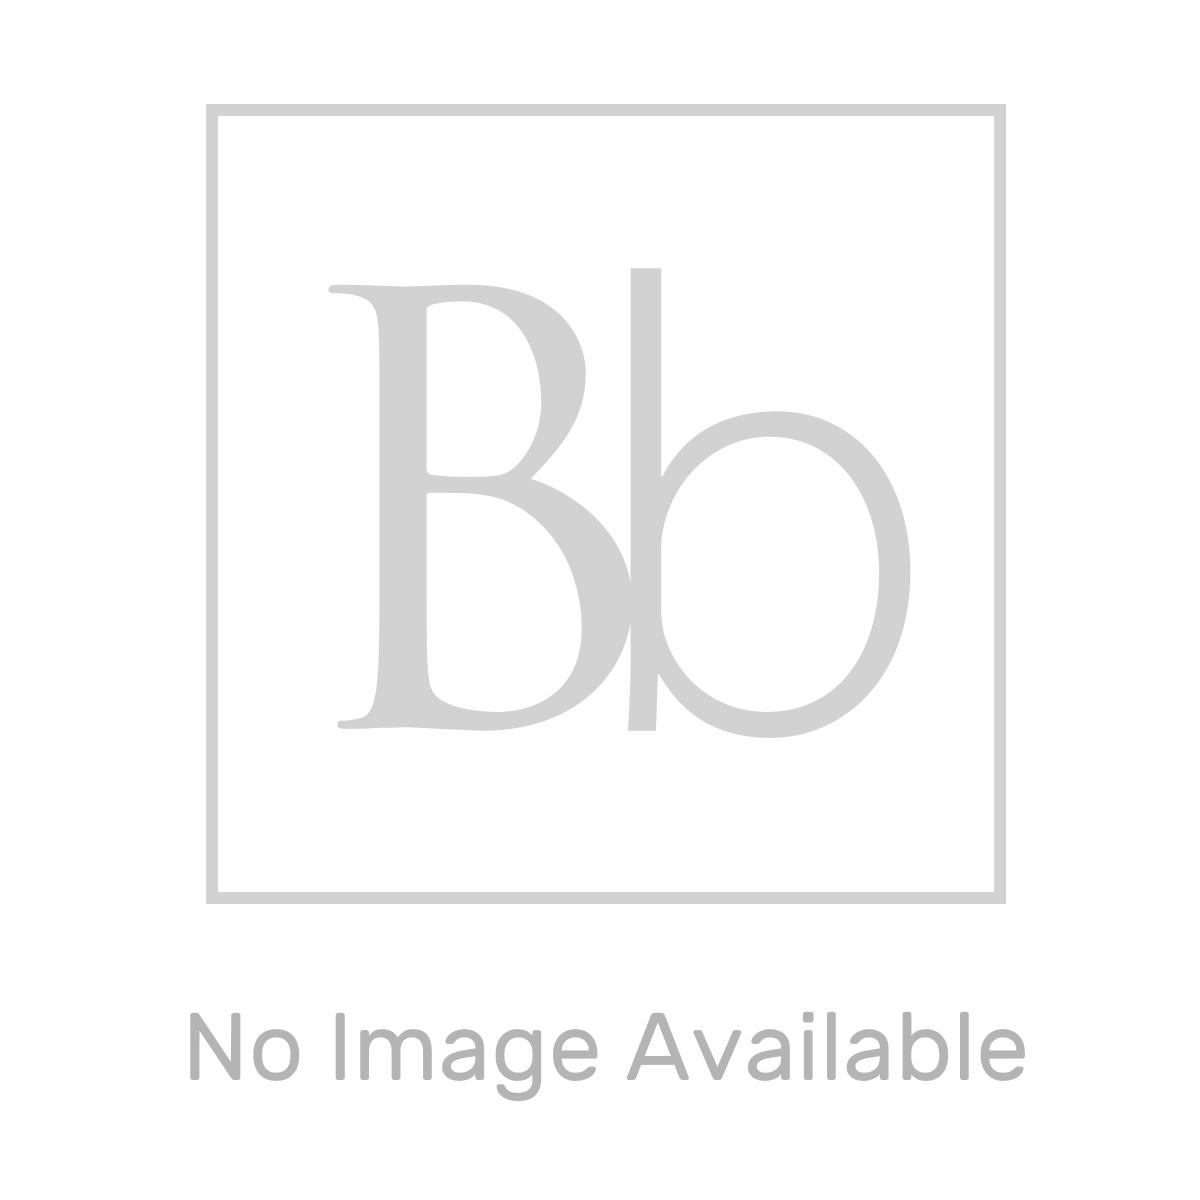 Frontline Aquaglass Sphere Black Sliding Shower Enclosure with Optional Side Panel Detail